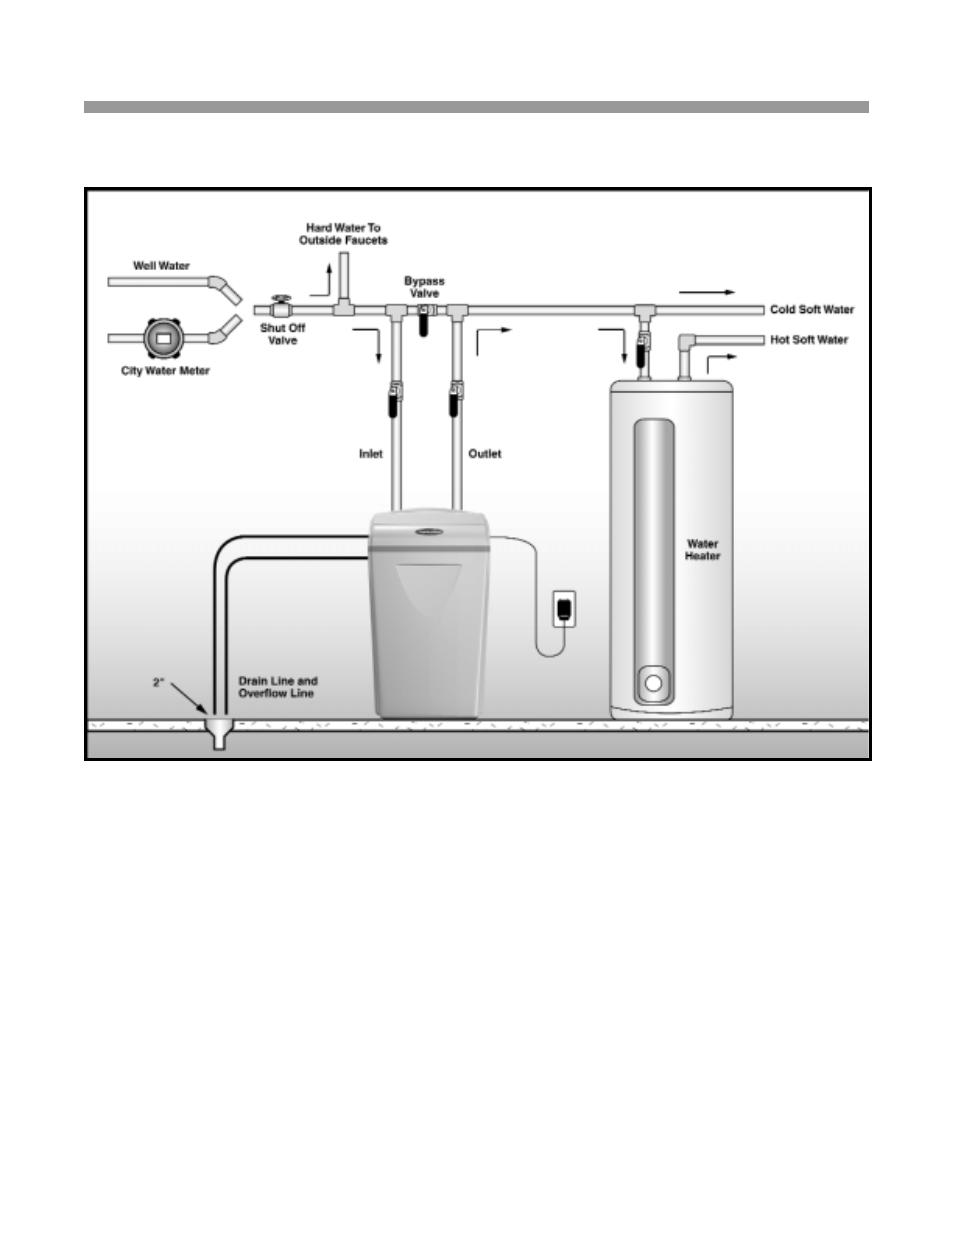 installation guide reference illustrations water boss 900 user rh manualsdir com WaterBoss 900 Water Softener Parts WaterBoss 900 Water Softener Parts